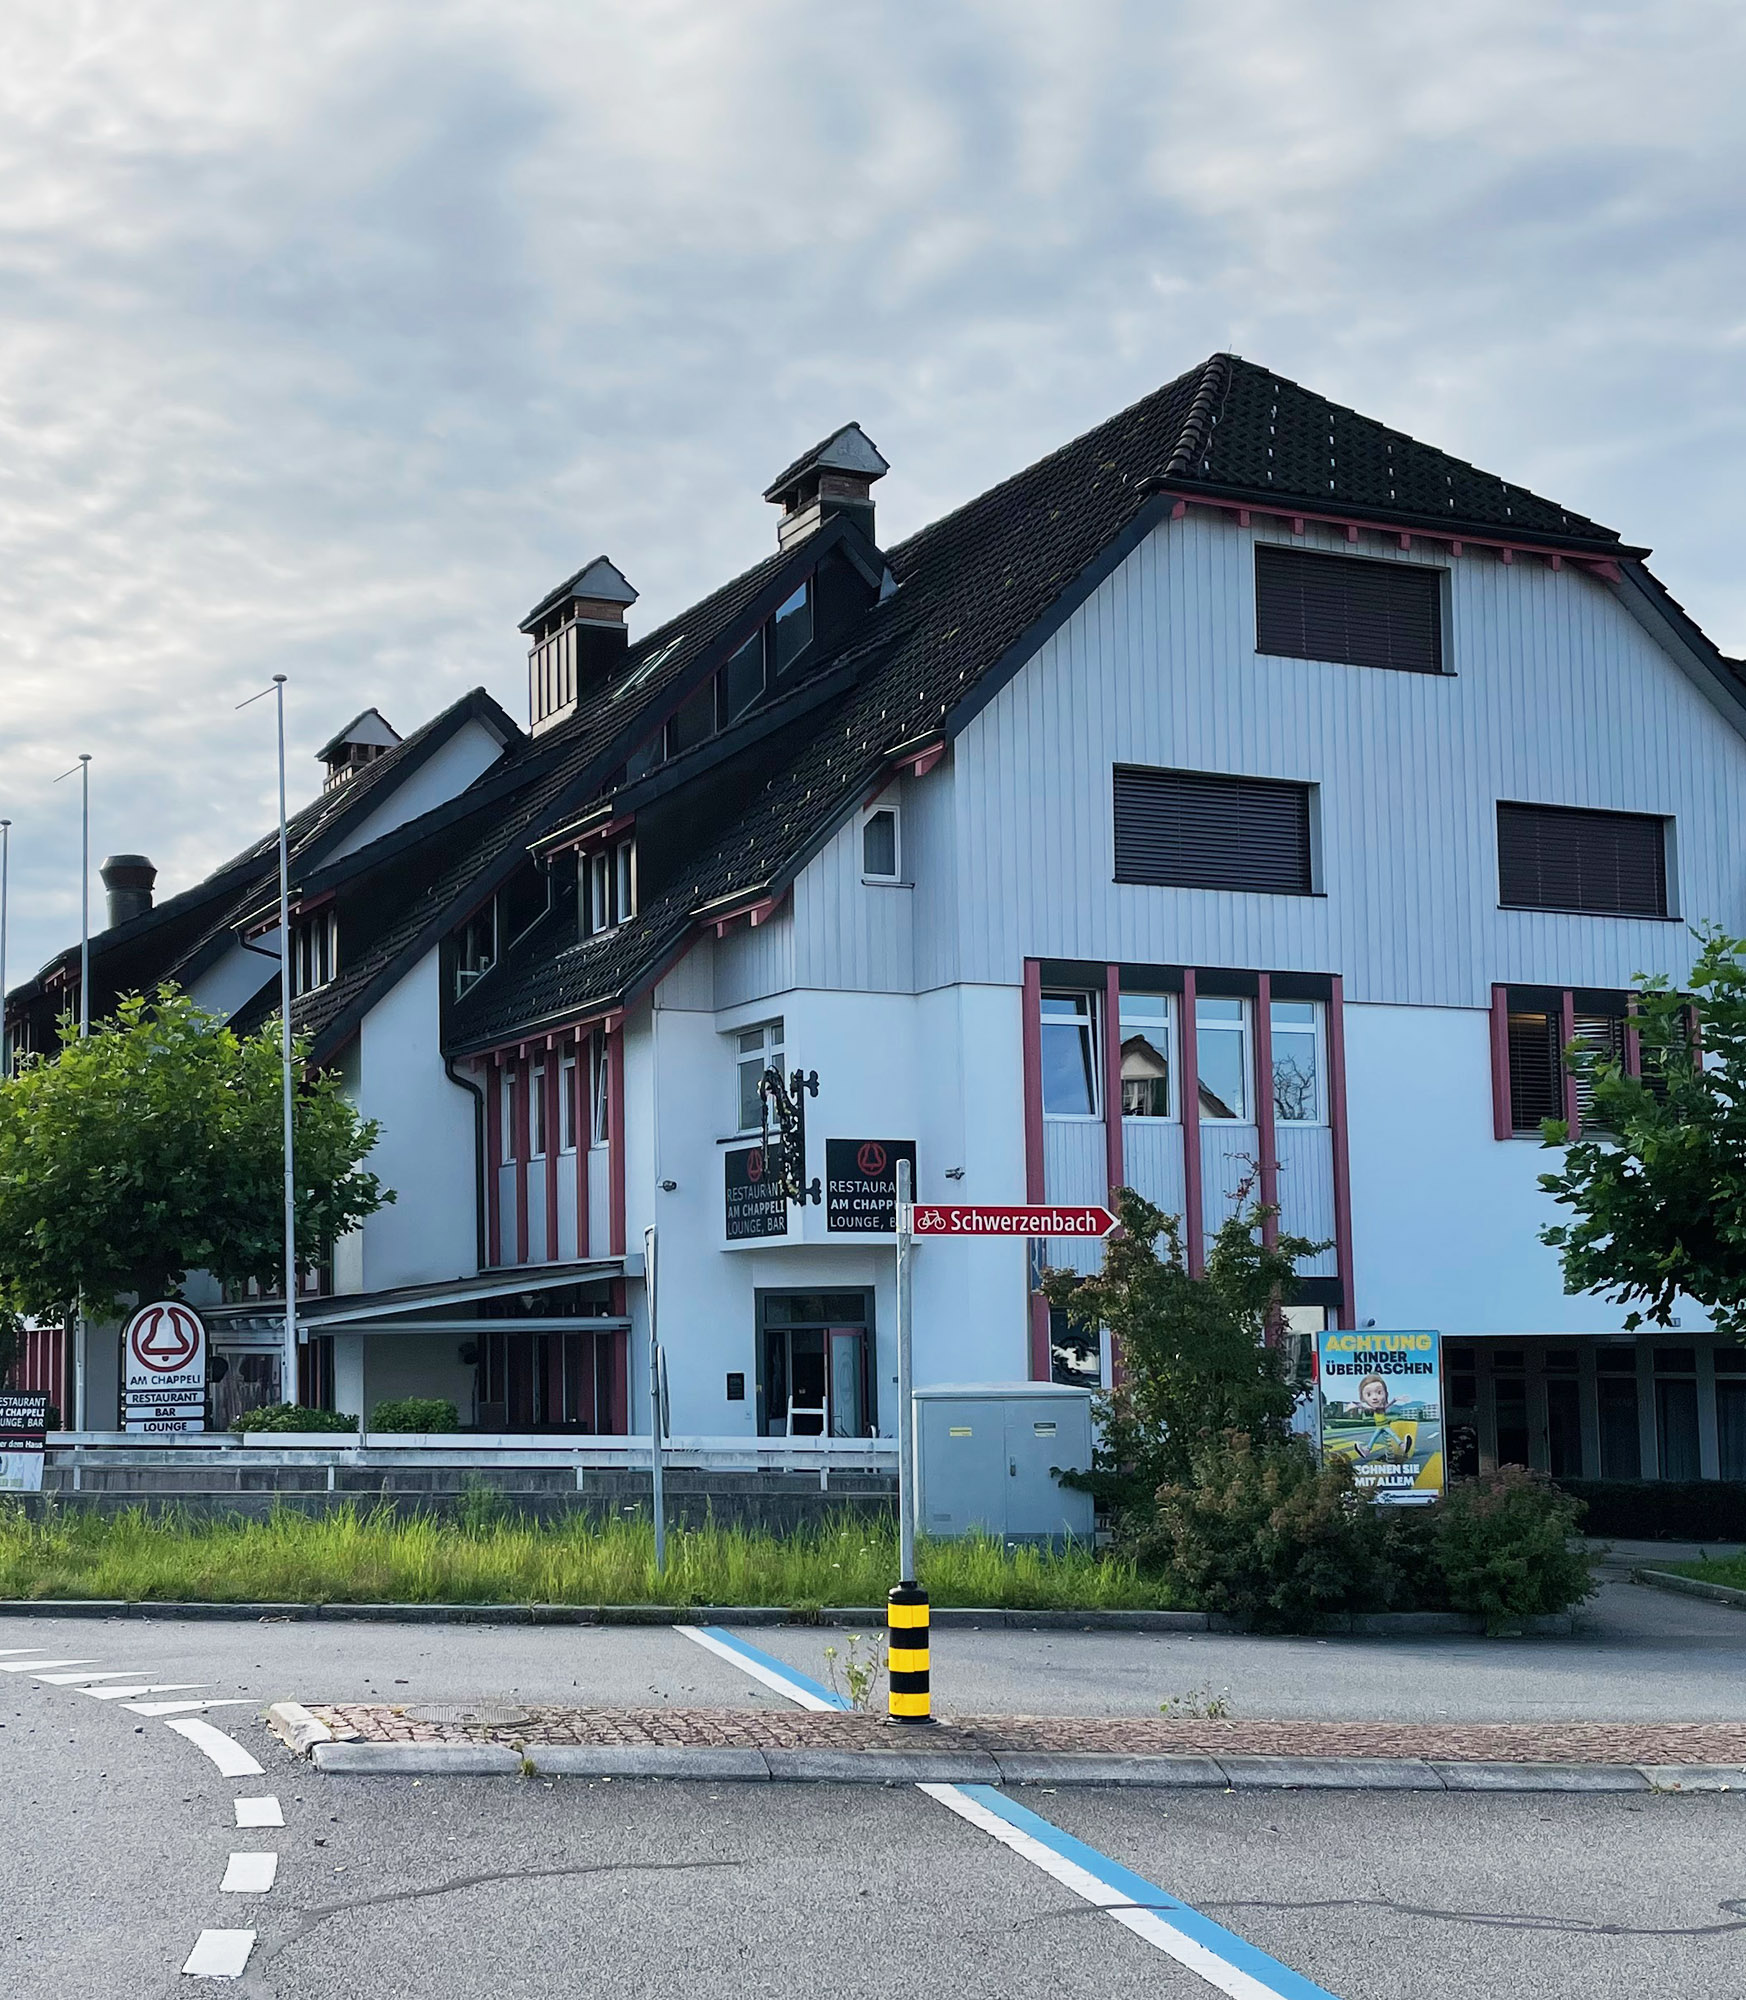 Restaurant am Chappeli - Willkommen - Blog-Beitrag